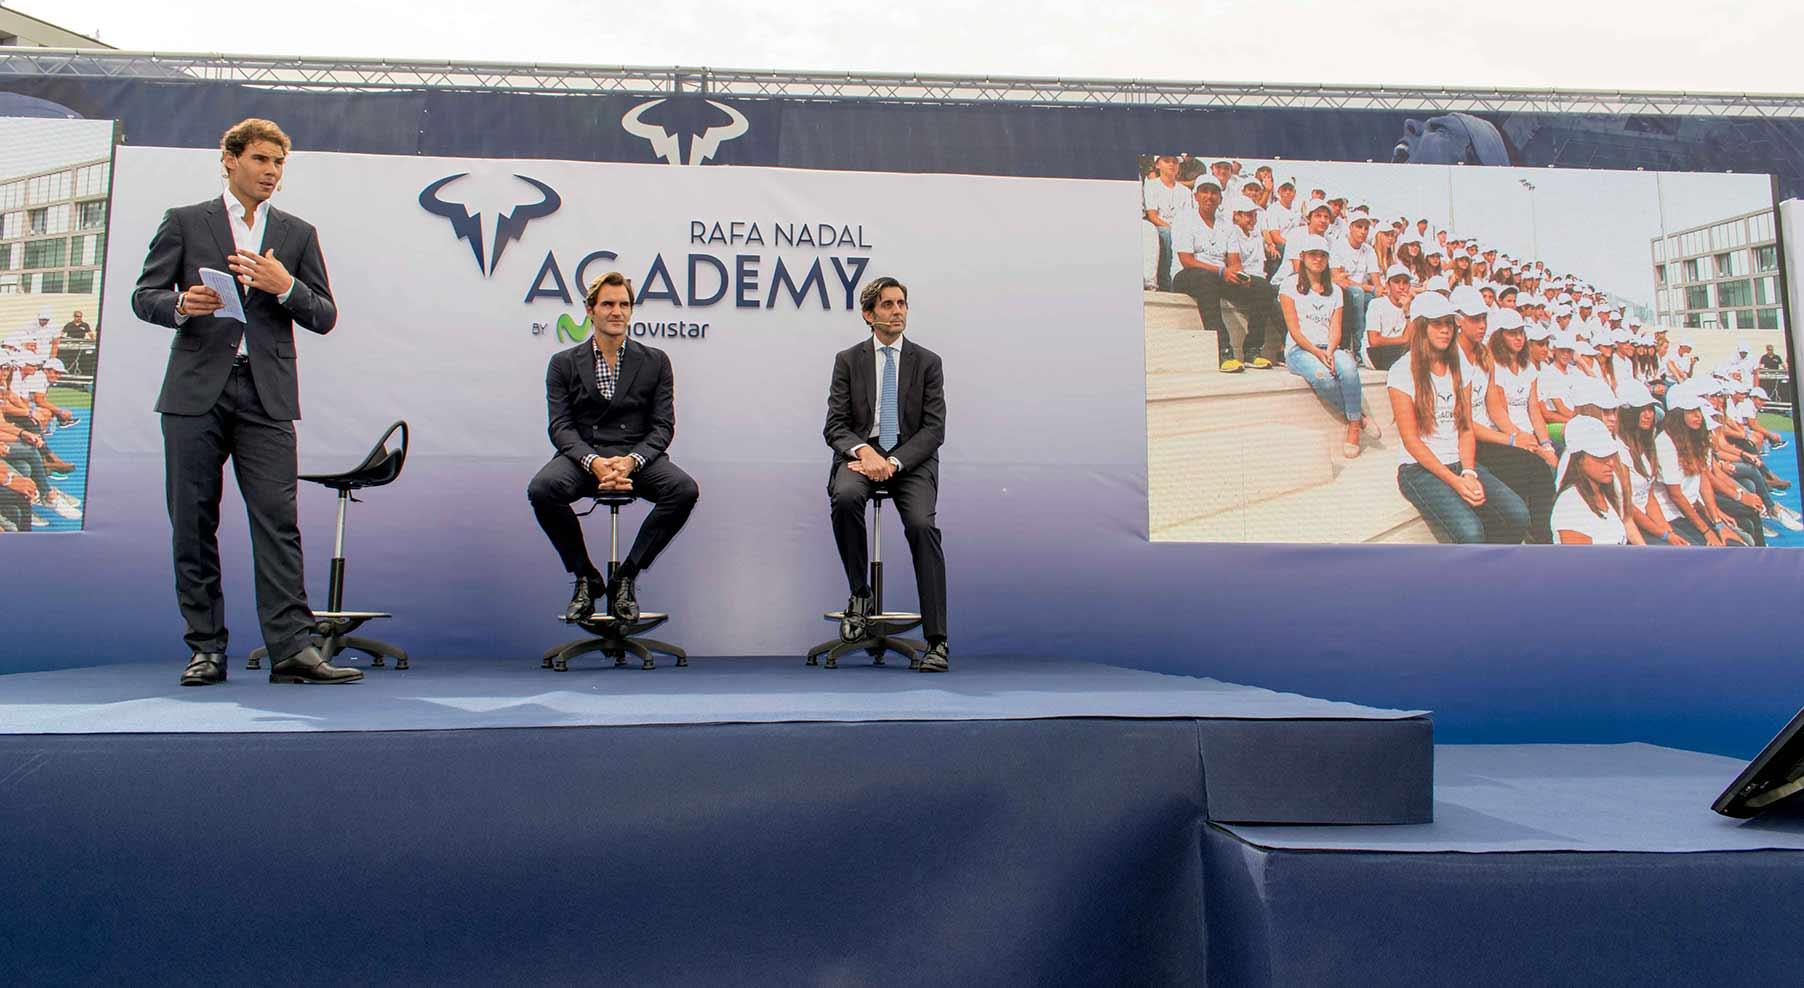 Programa completo emitido en Teledeporte sobre la Academia de tenis de Rafa Nadal